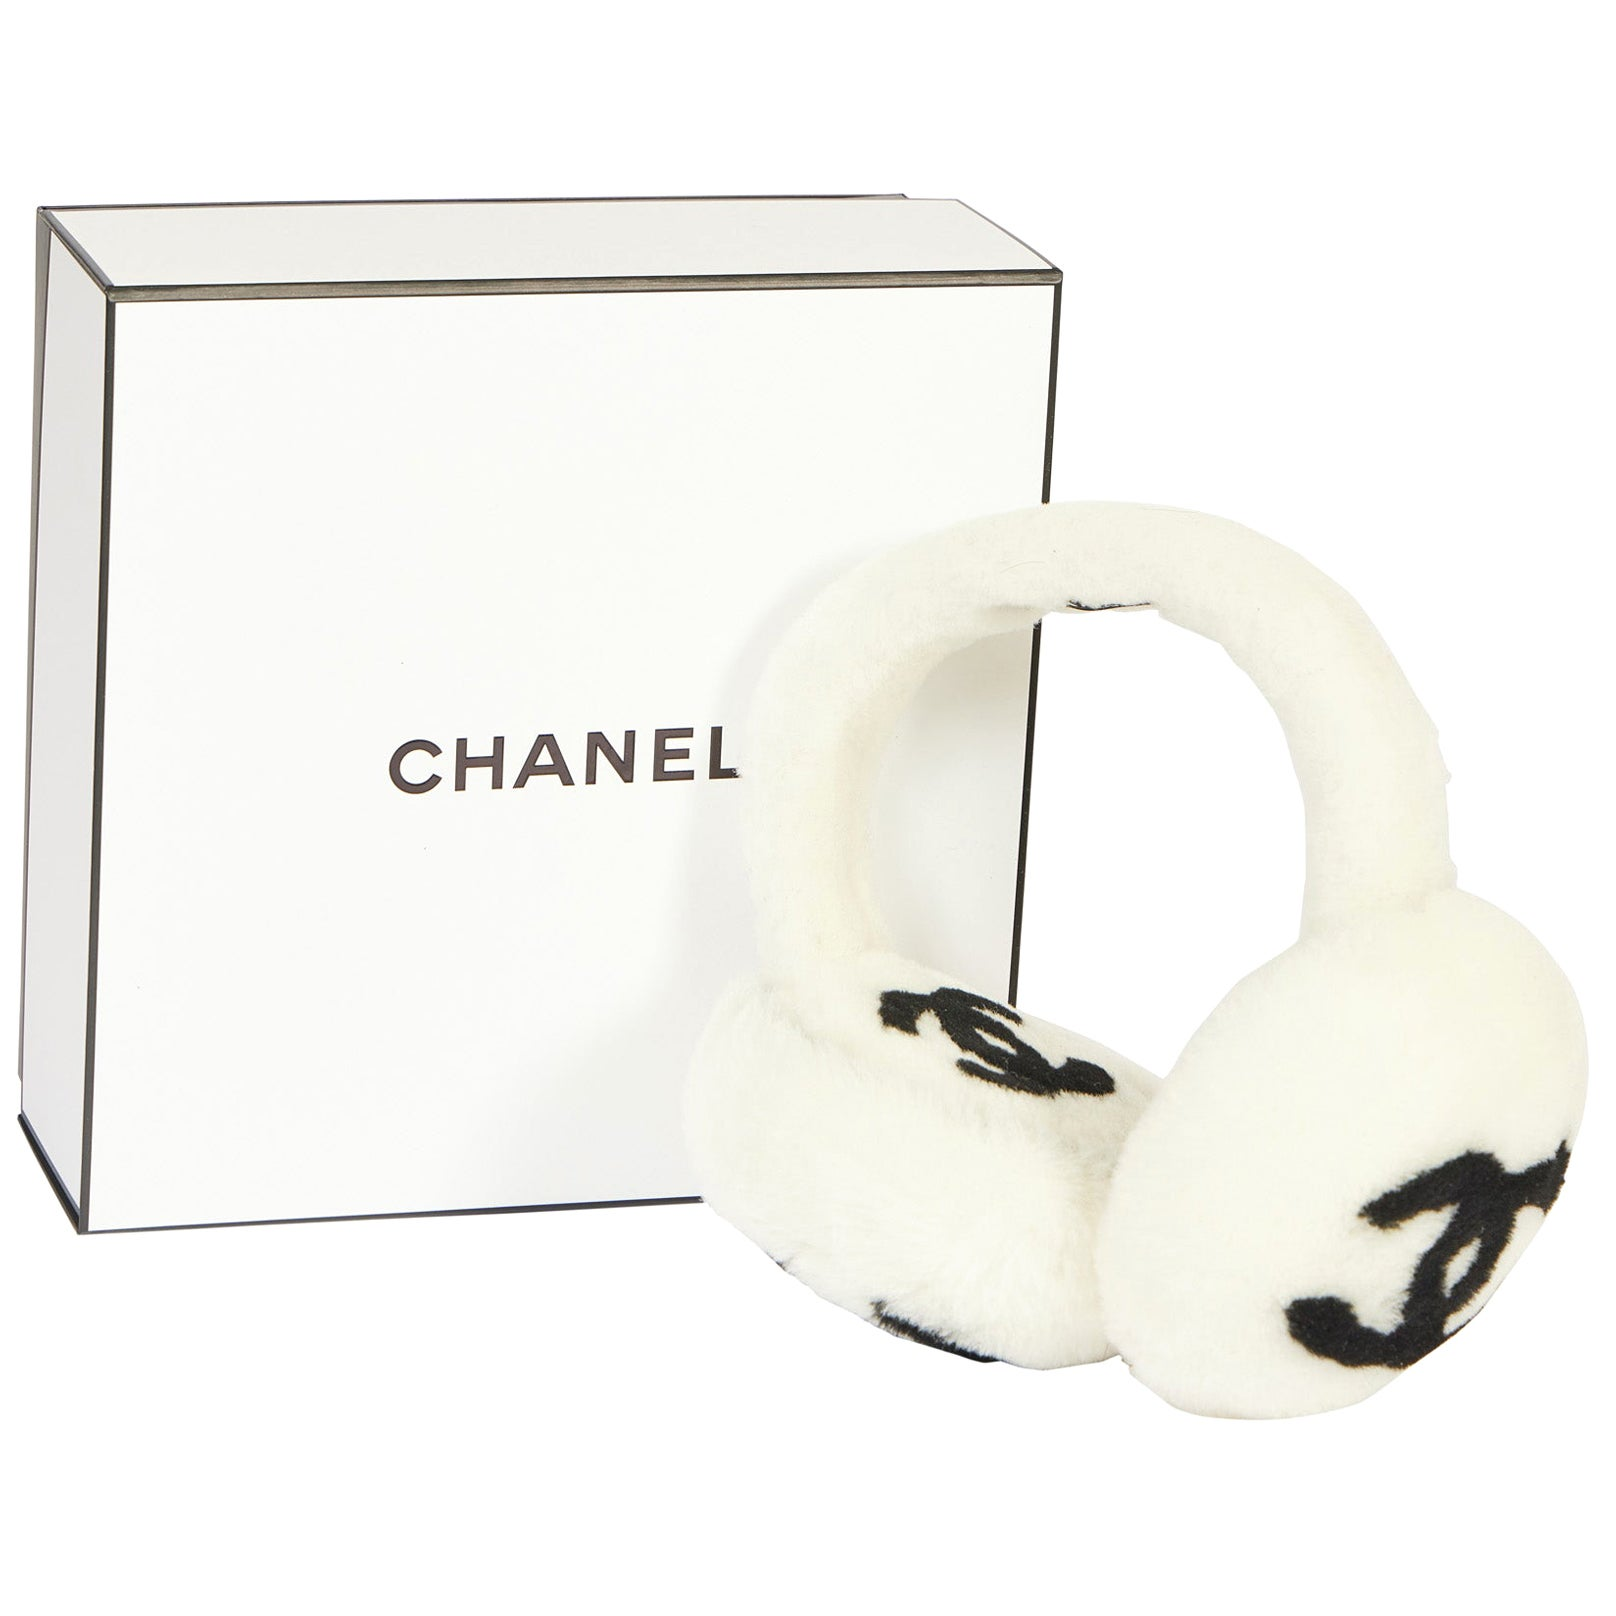 New Chanel Shearling White Black Logo Ear Muffs in Box